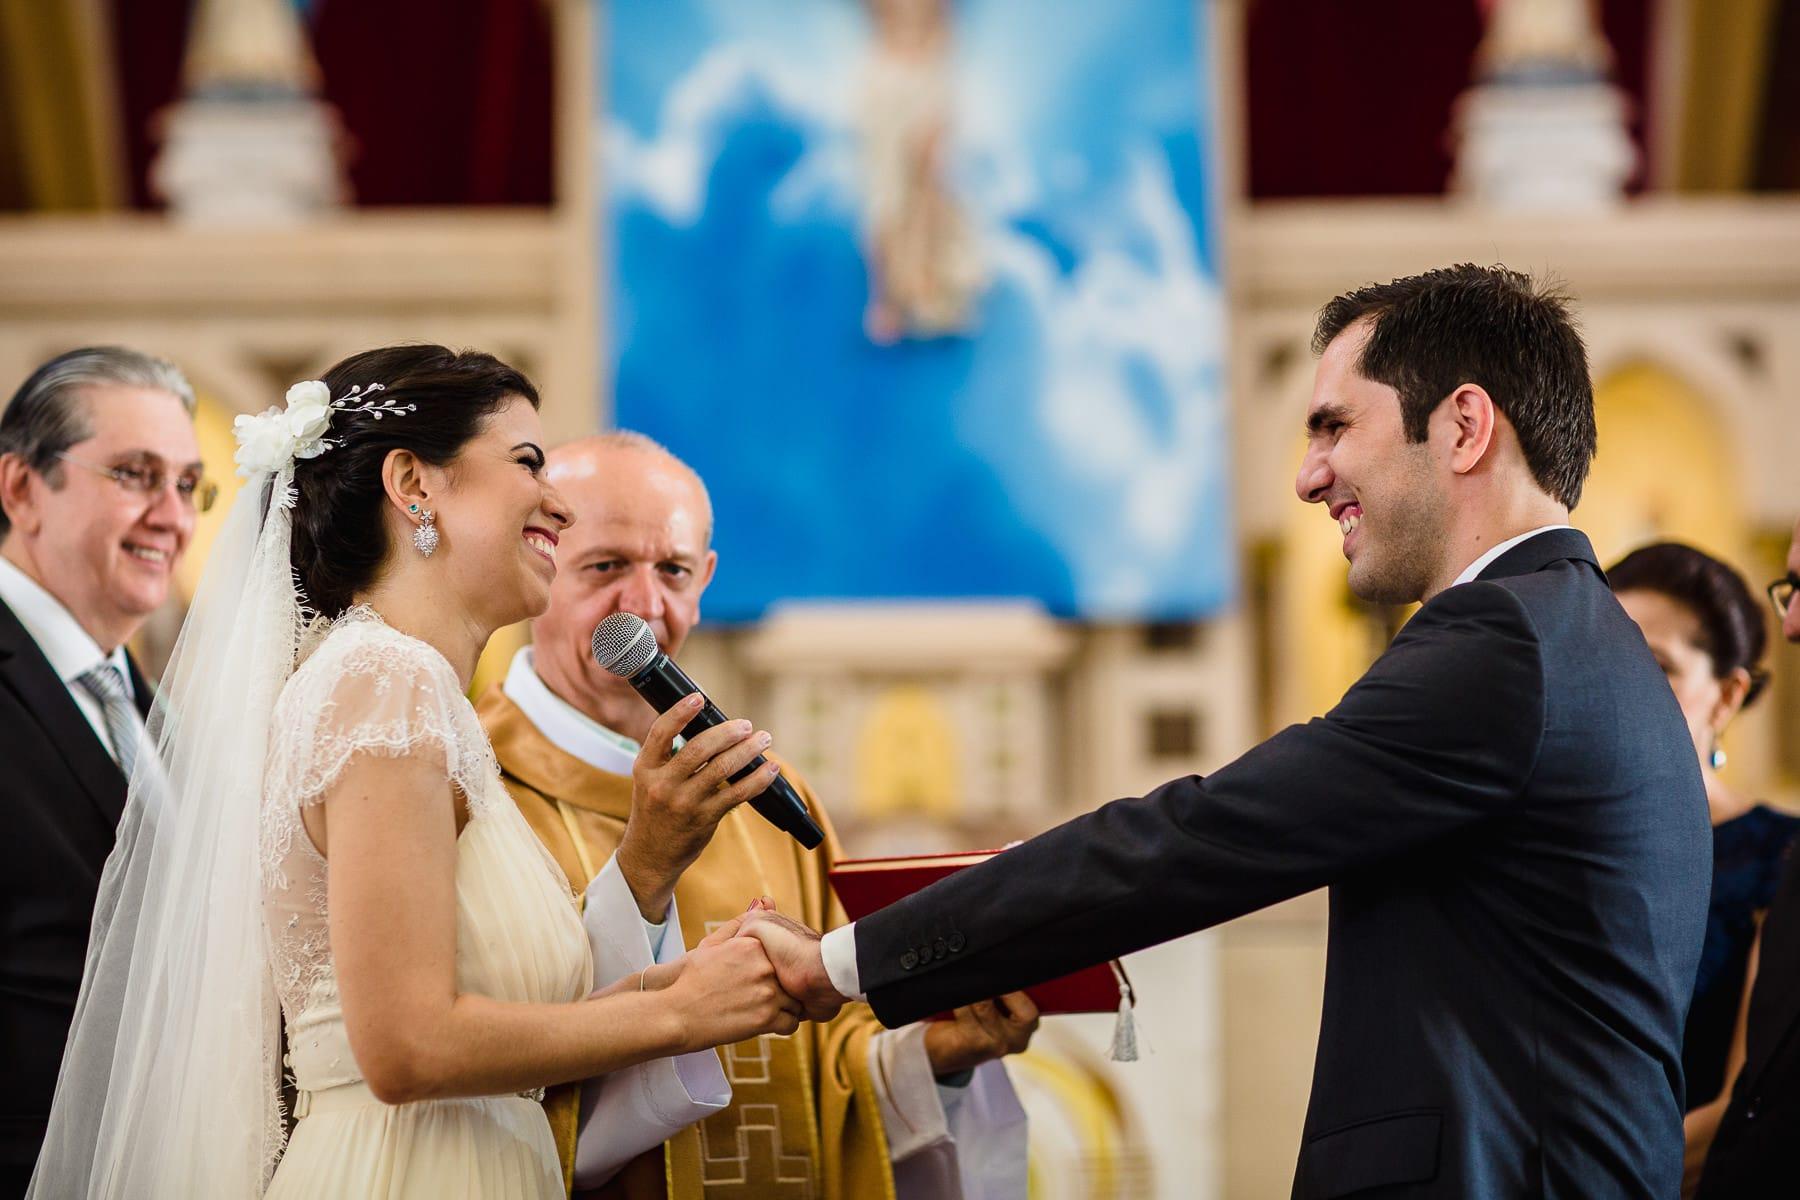 casamento-igreja-do-cristo-rei-fortaleza-46